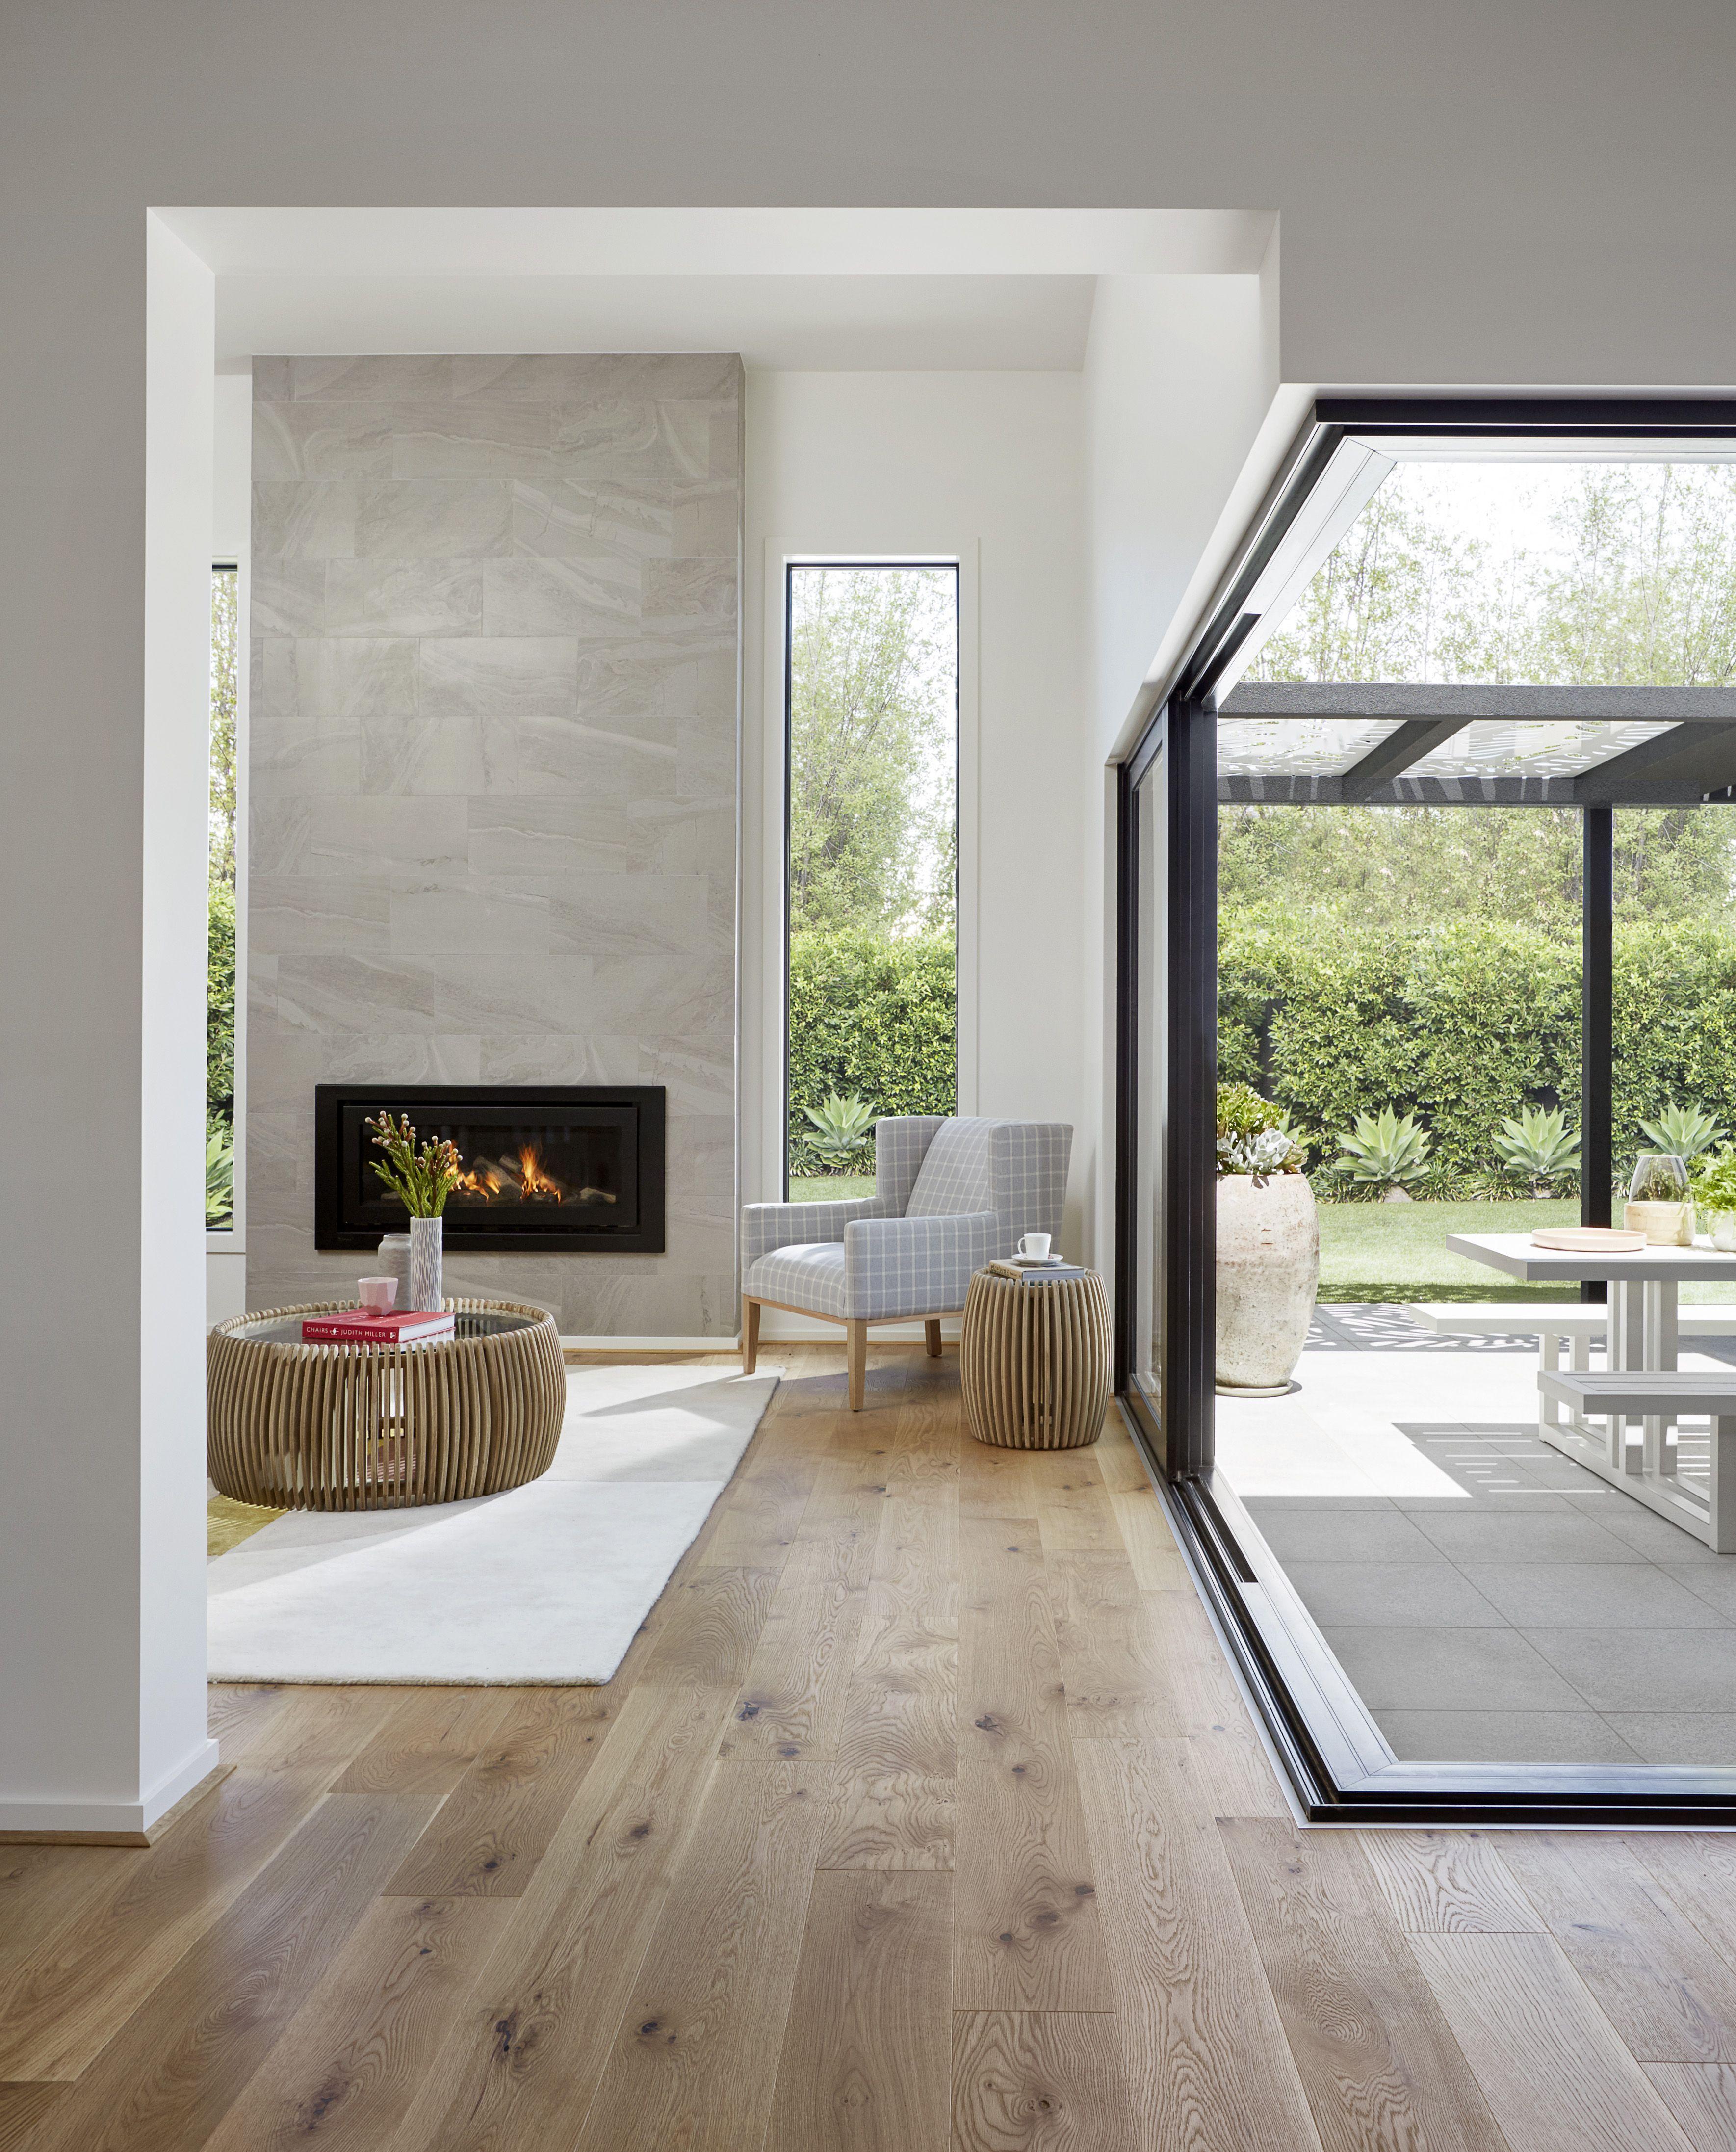 Coco Republic Interior Design Produced A Contemporary Living Space